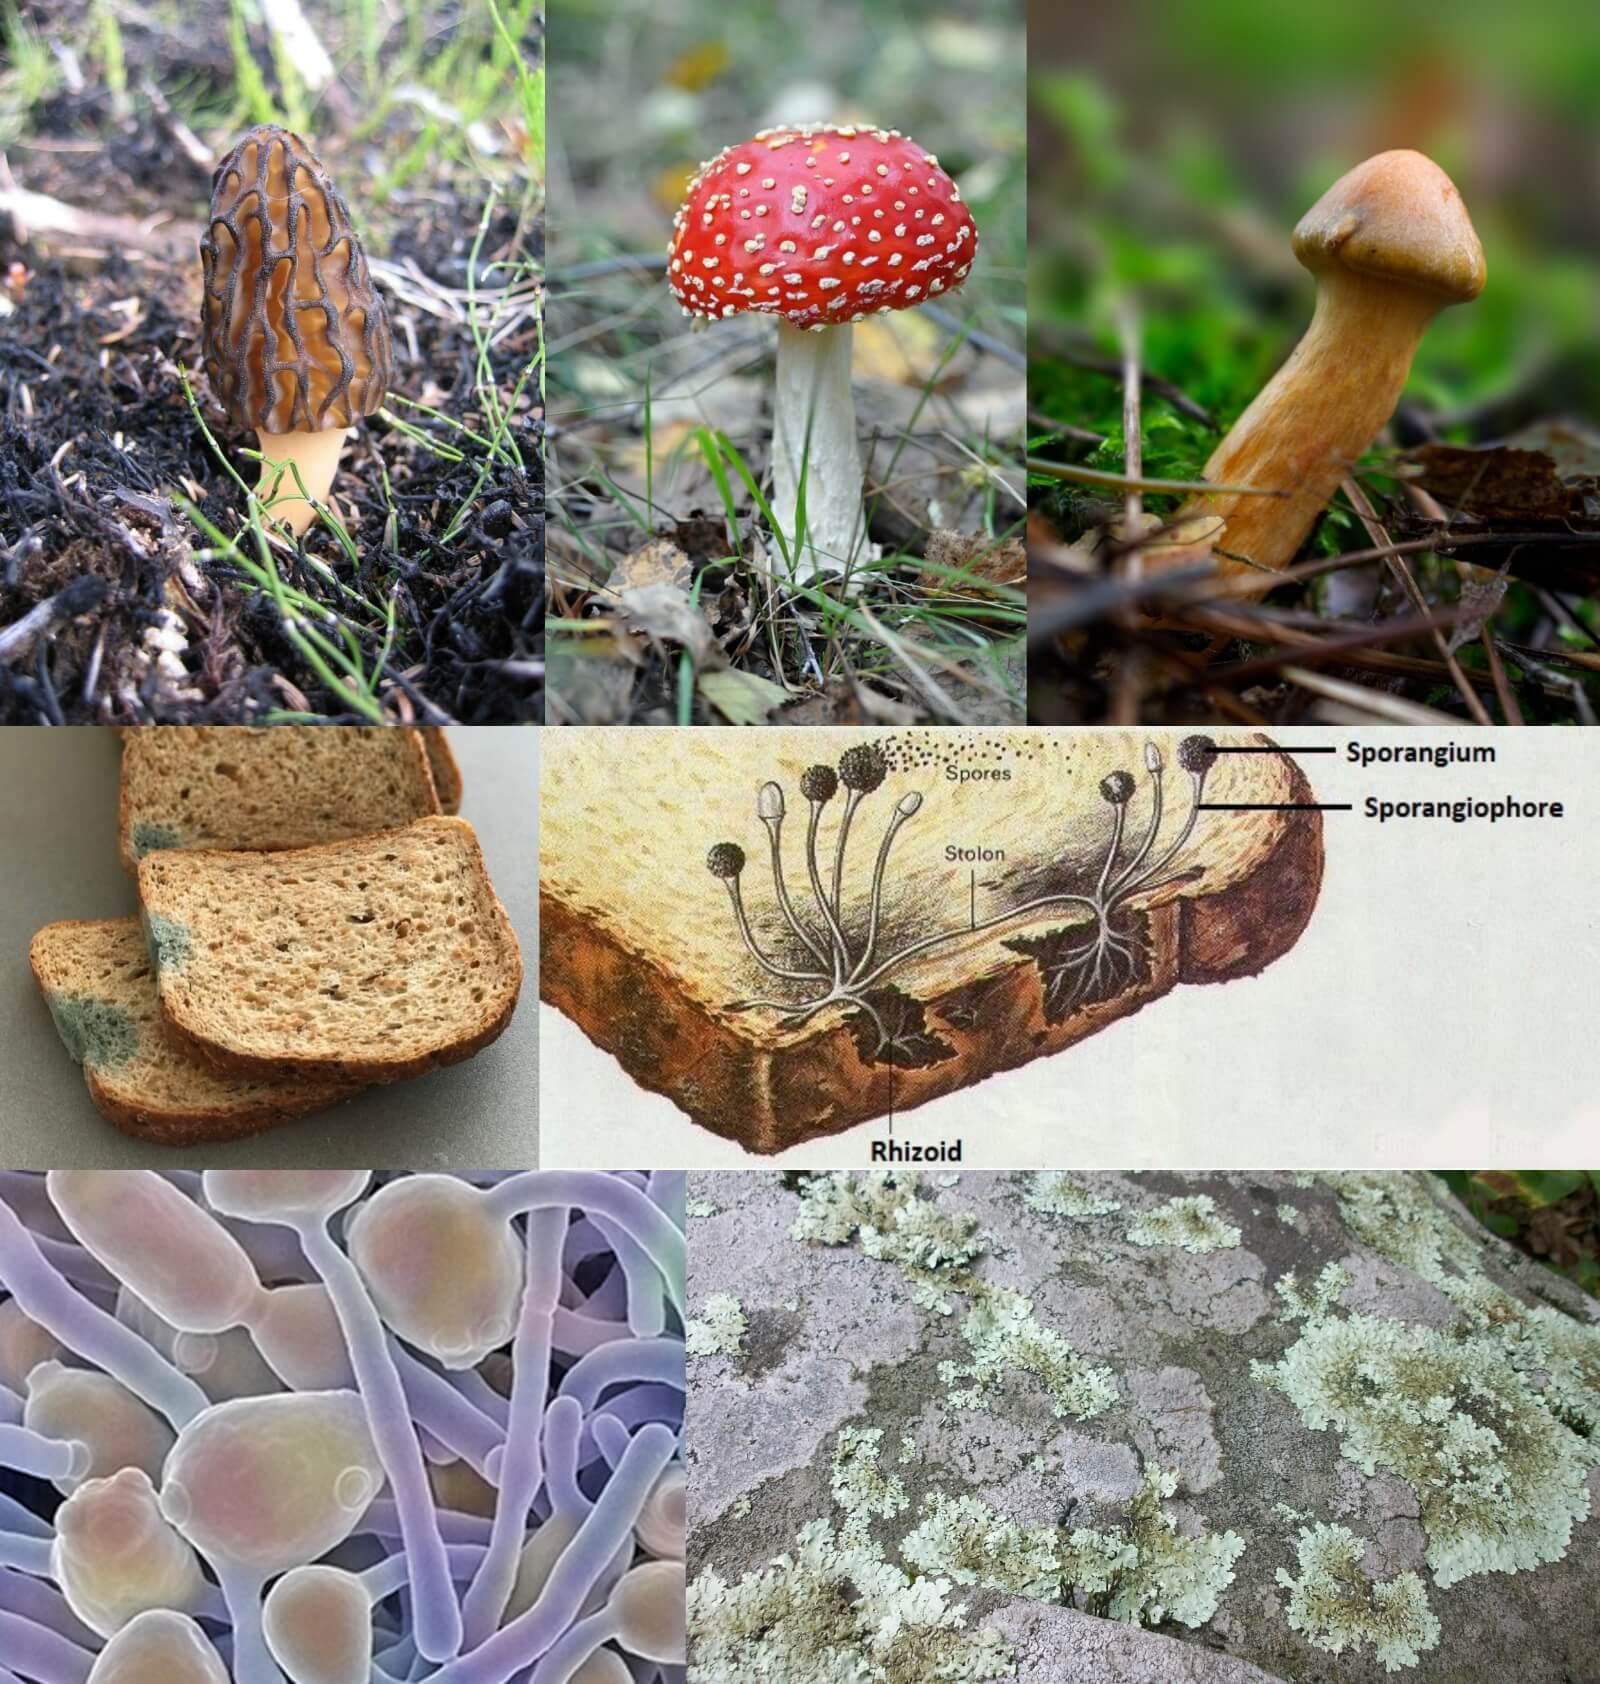 fungi structure mushroom bread mold